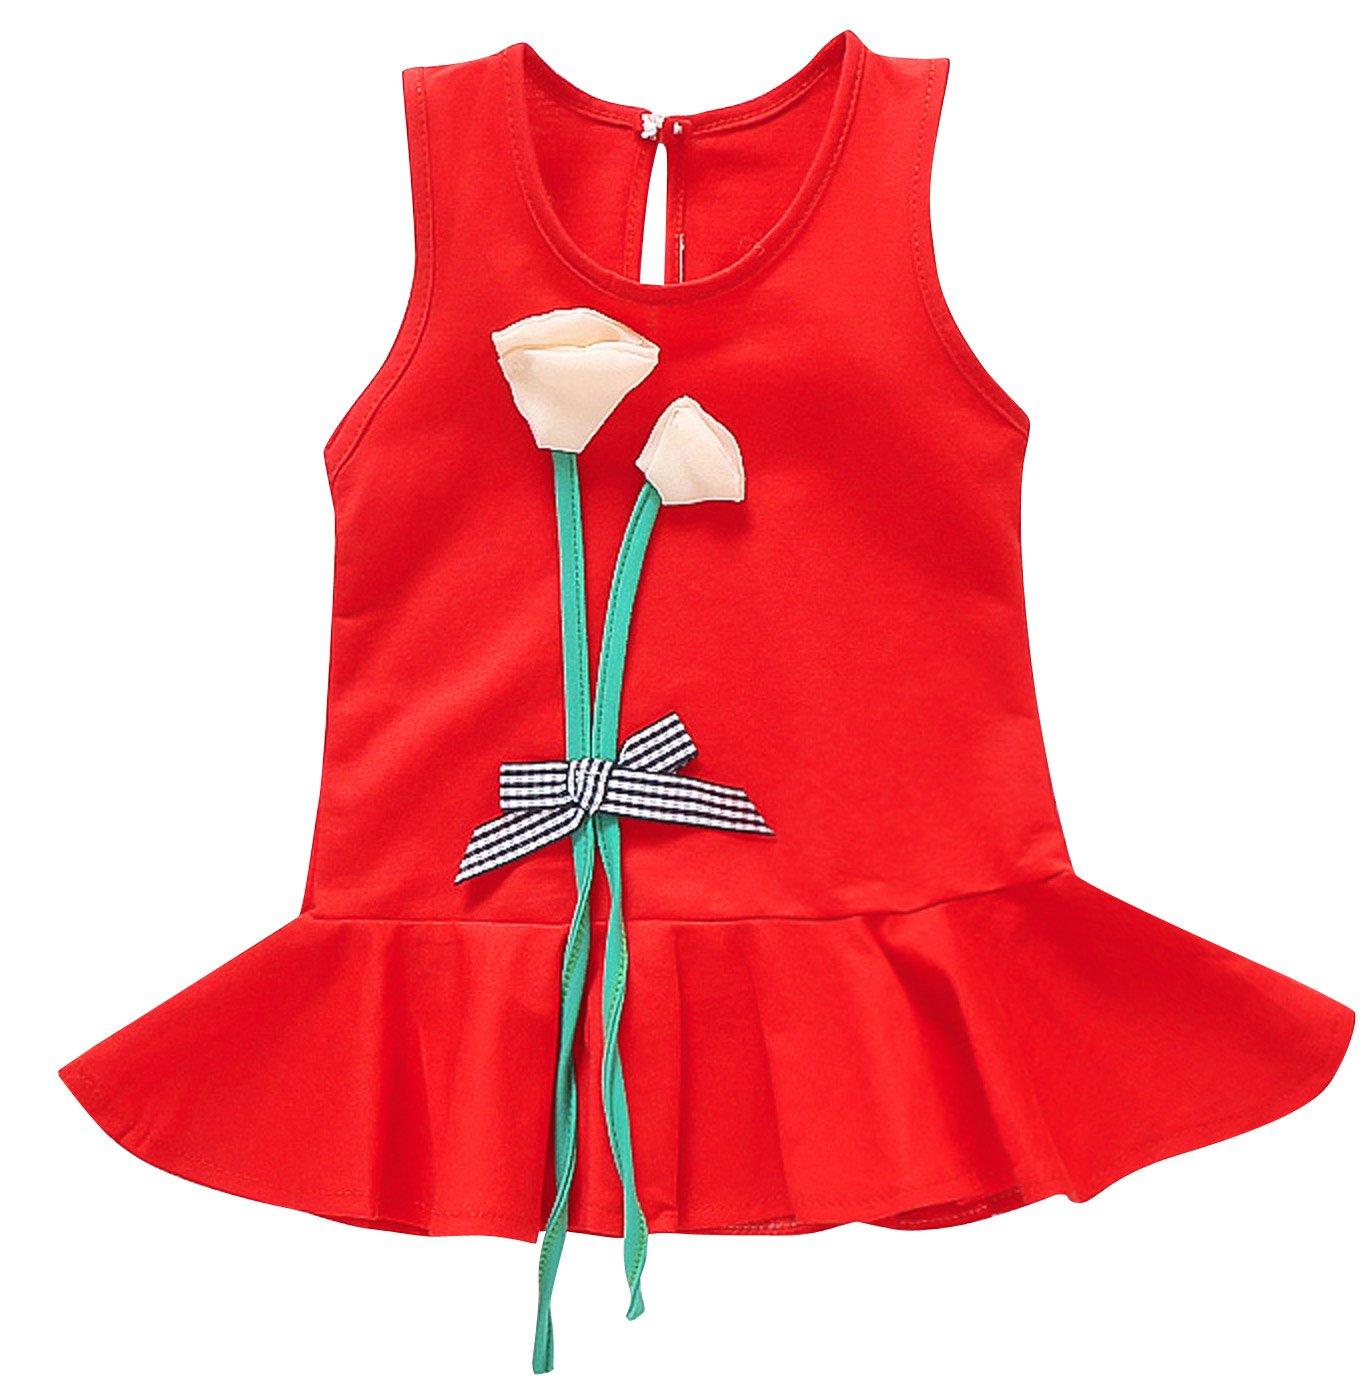 Baby Girls Cotton Dress UV Protection Tulip Bowknot Midi Summer Dress Red 3T